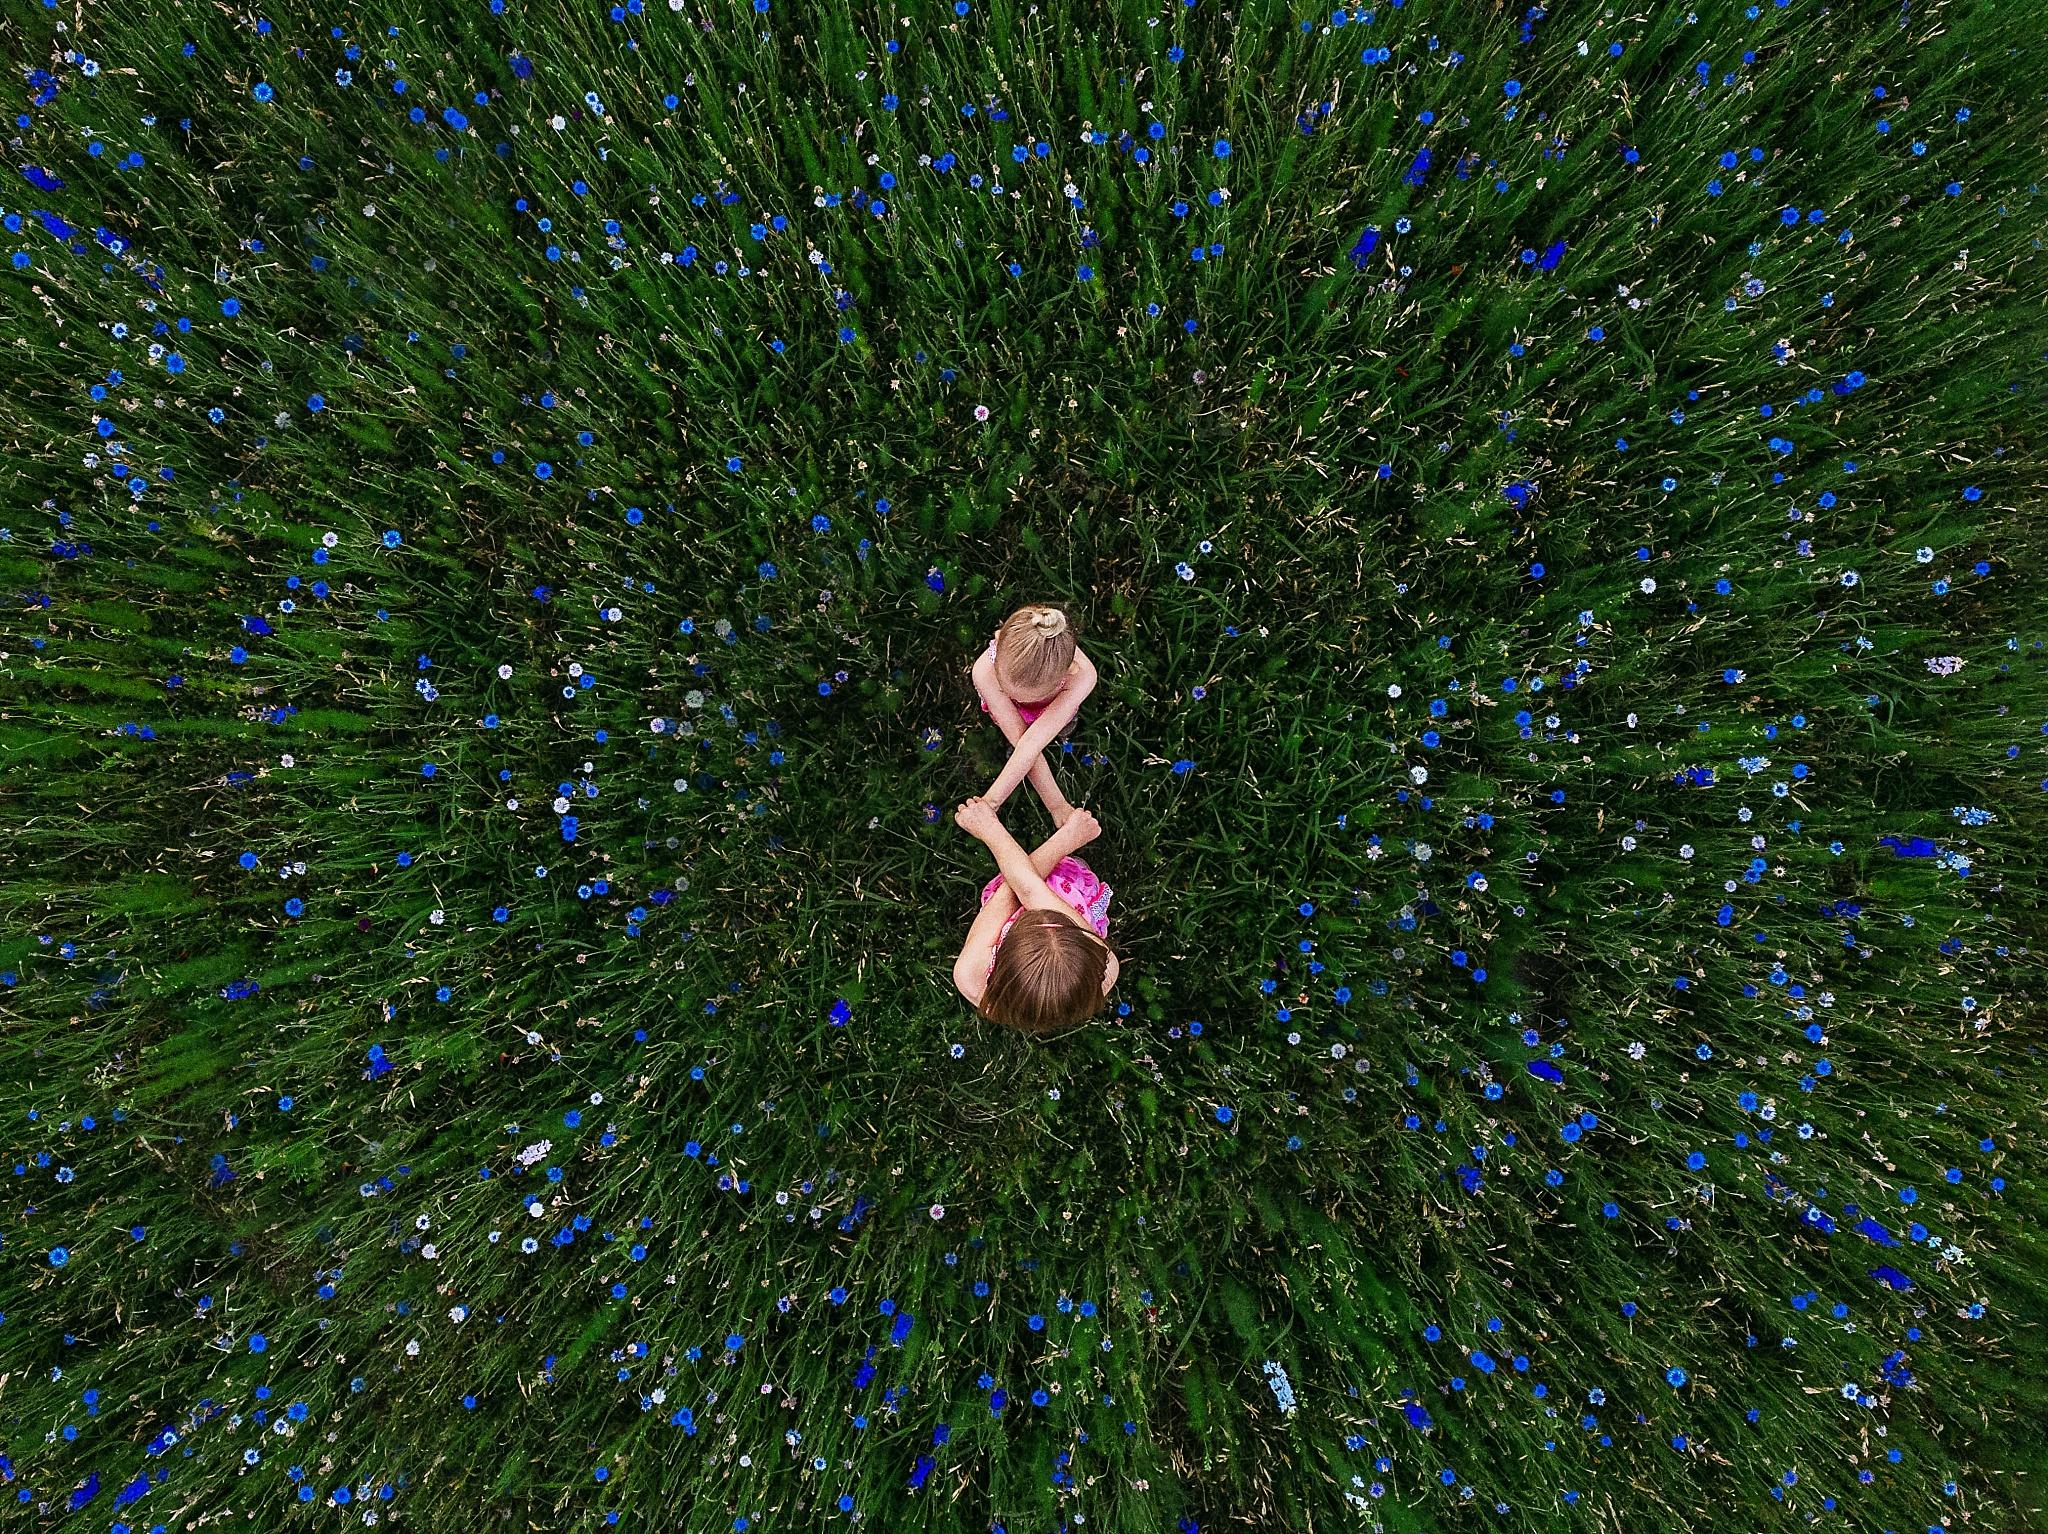 08Drone Flowers_Libby Grohmann.jpg